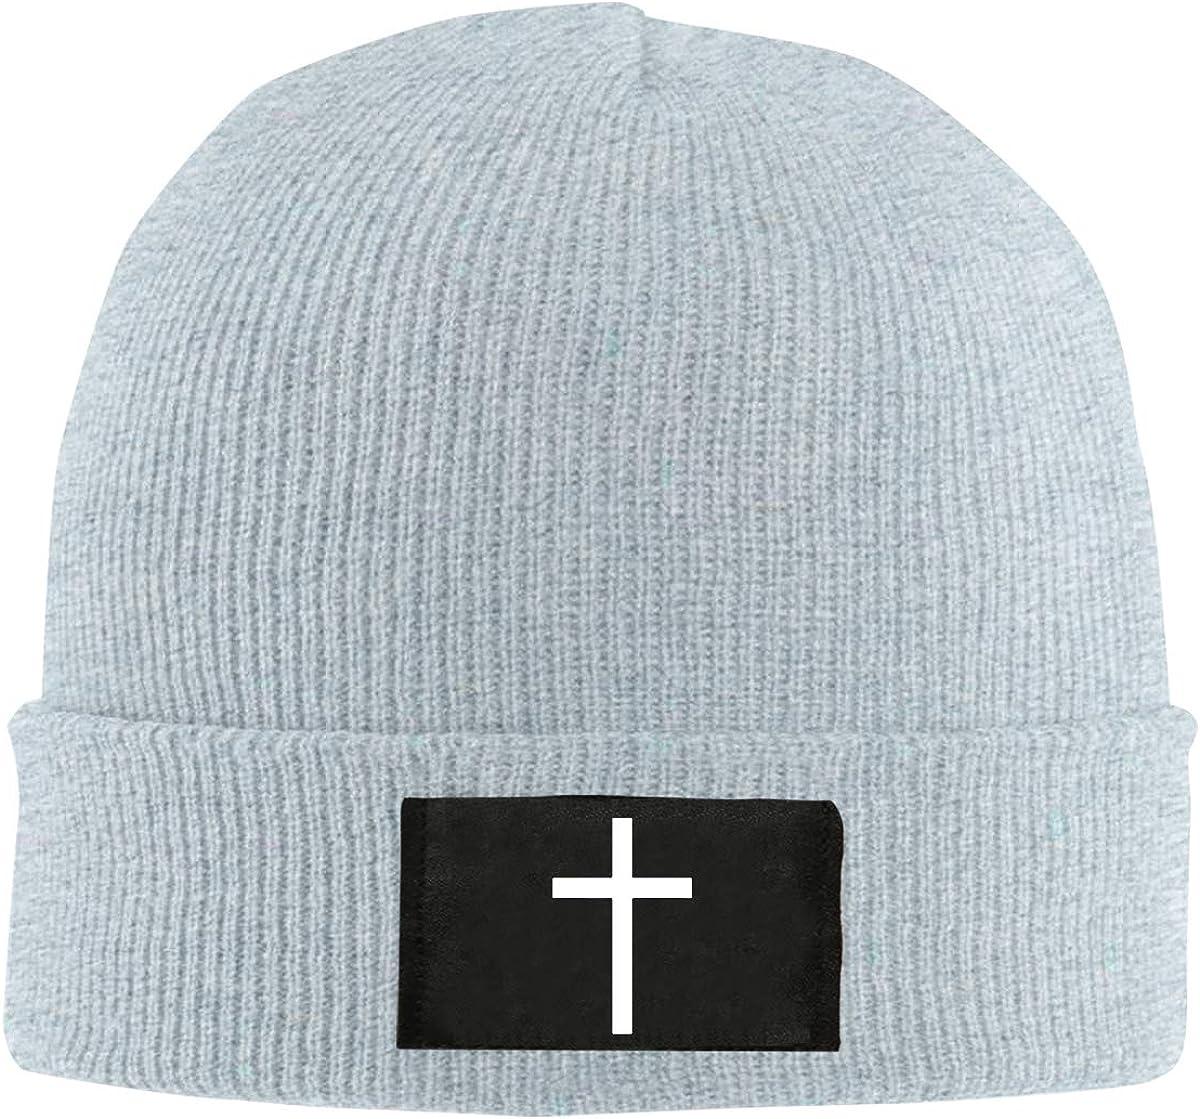 Men Women Cross Platinum Style Skull Hat Beanie Cap Winter Knit ...